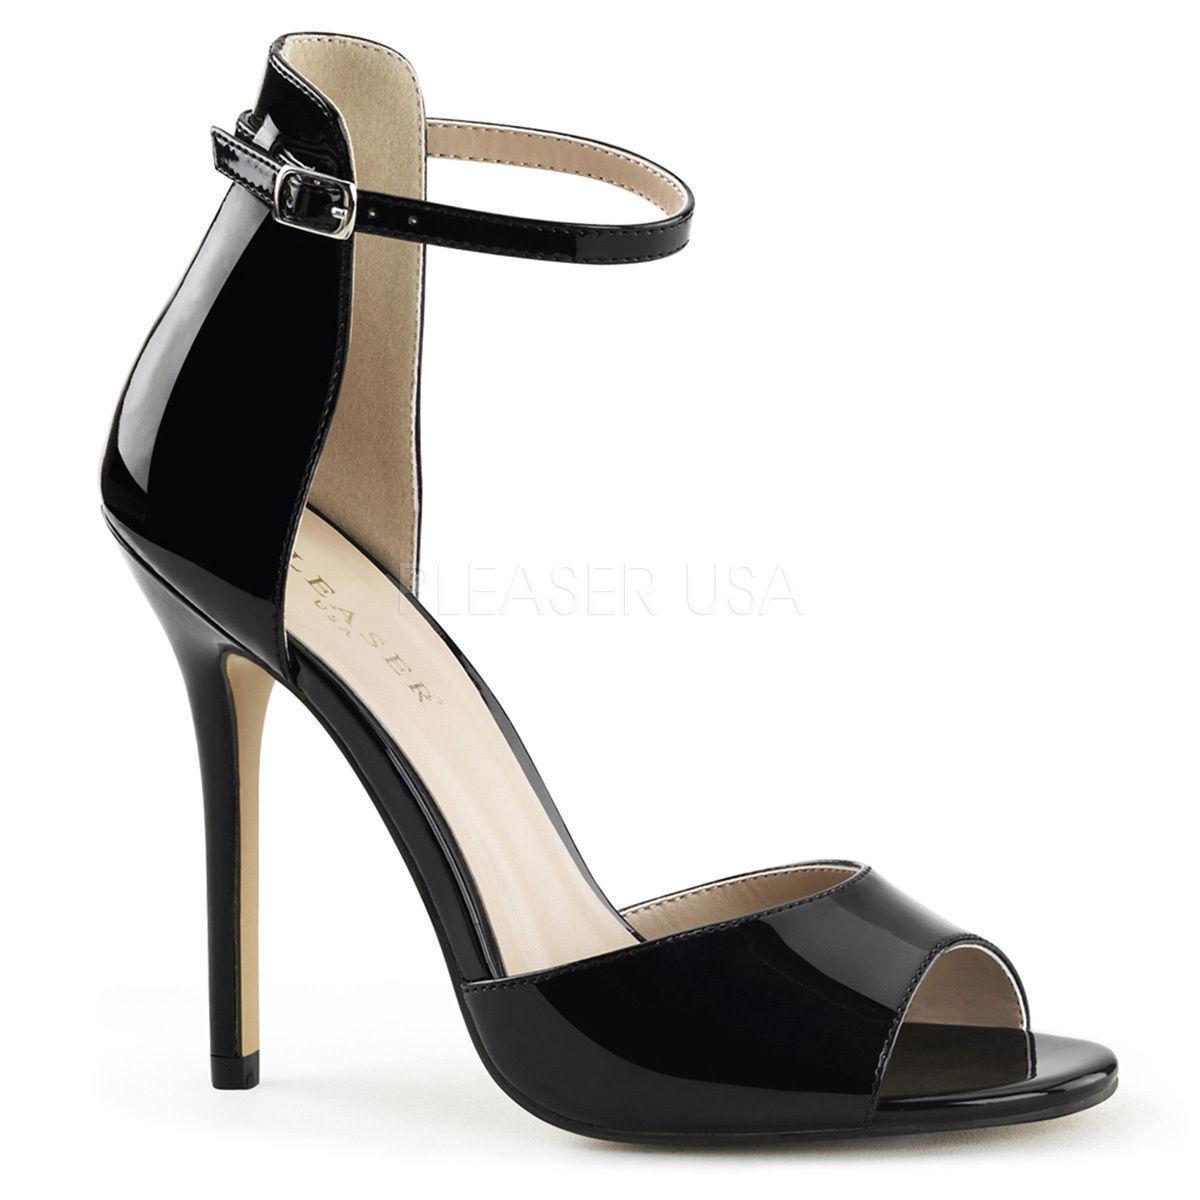 Amuse - 14 elegante Pleaser señora High-heels sandalias negro charol tamaños 35-45